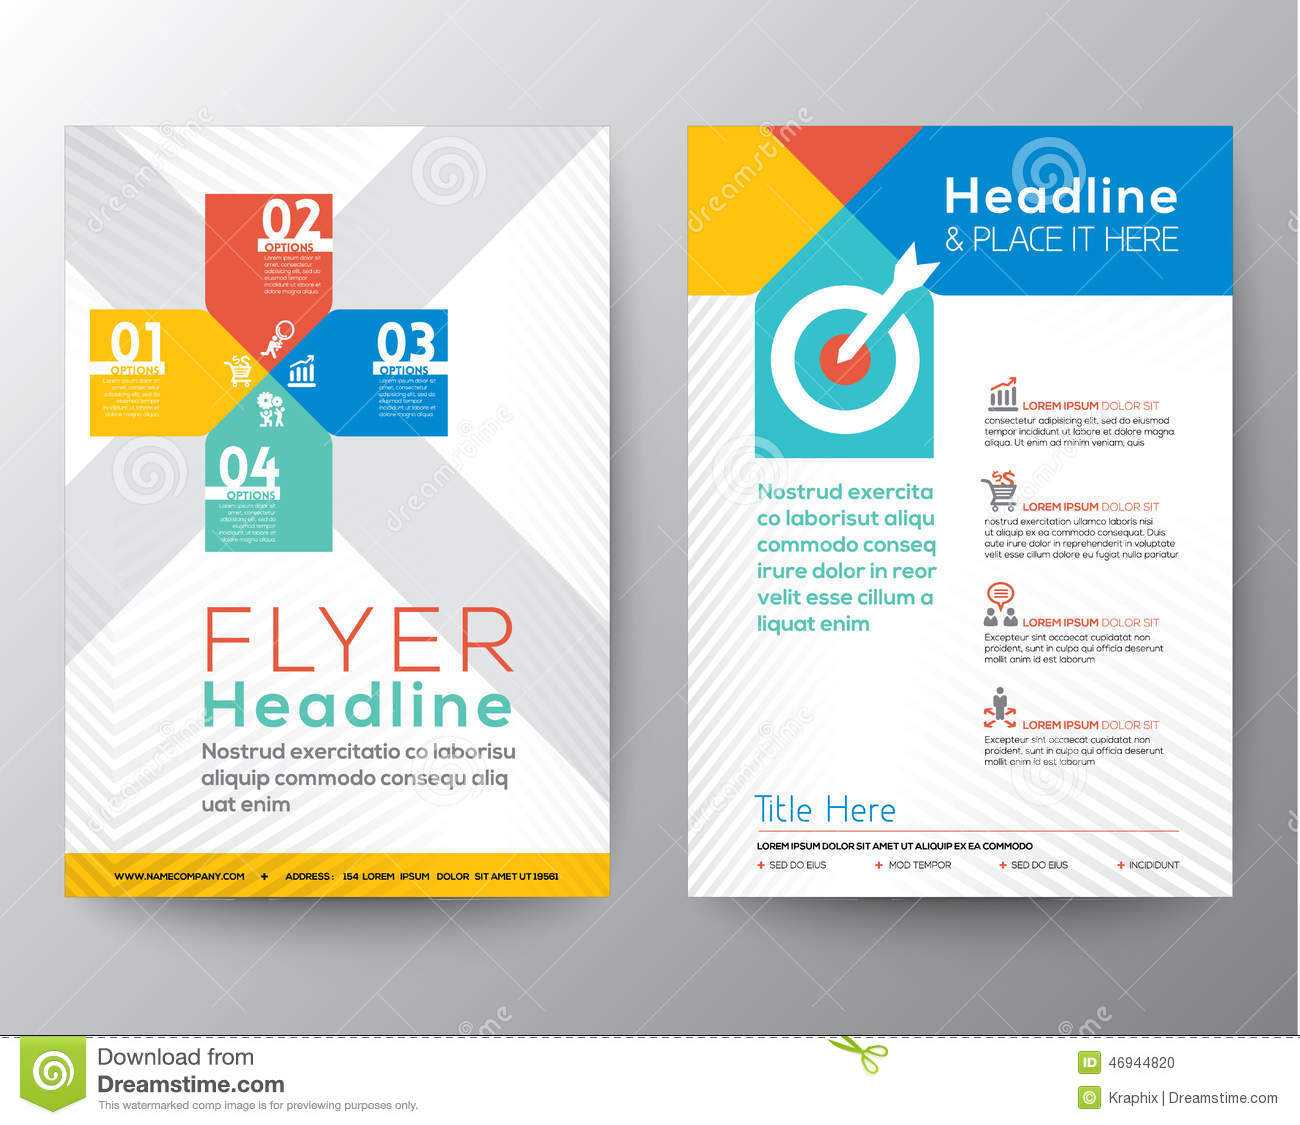 Graphic Design Flyer Templates Free – Colona.rsd7 Within Design Flyers Templates Online Free